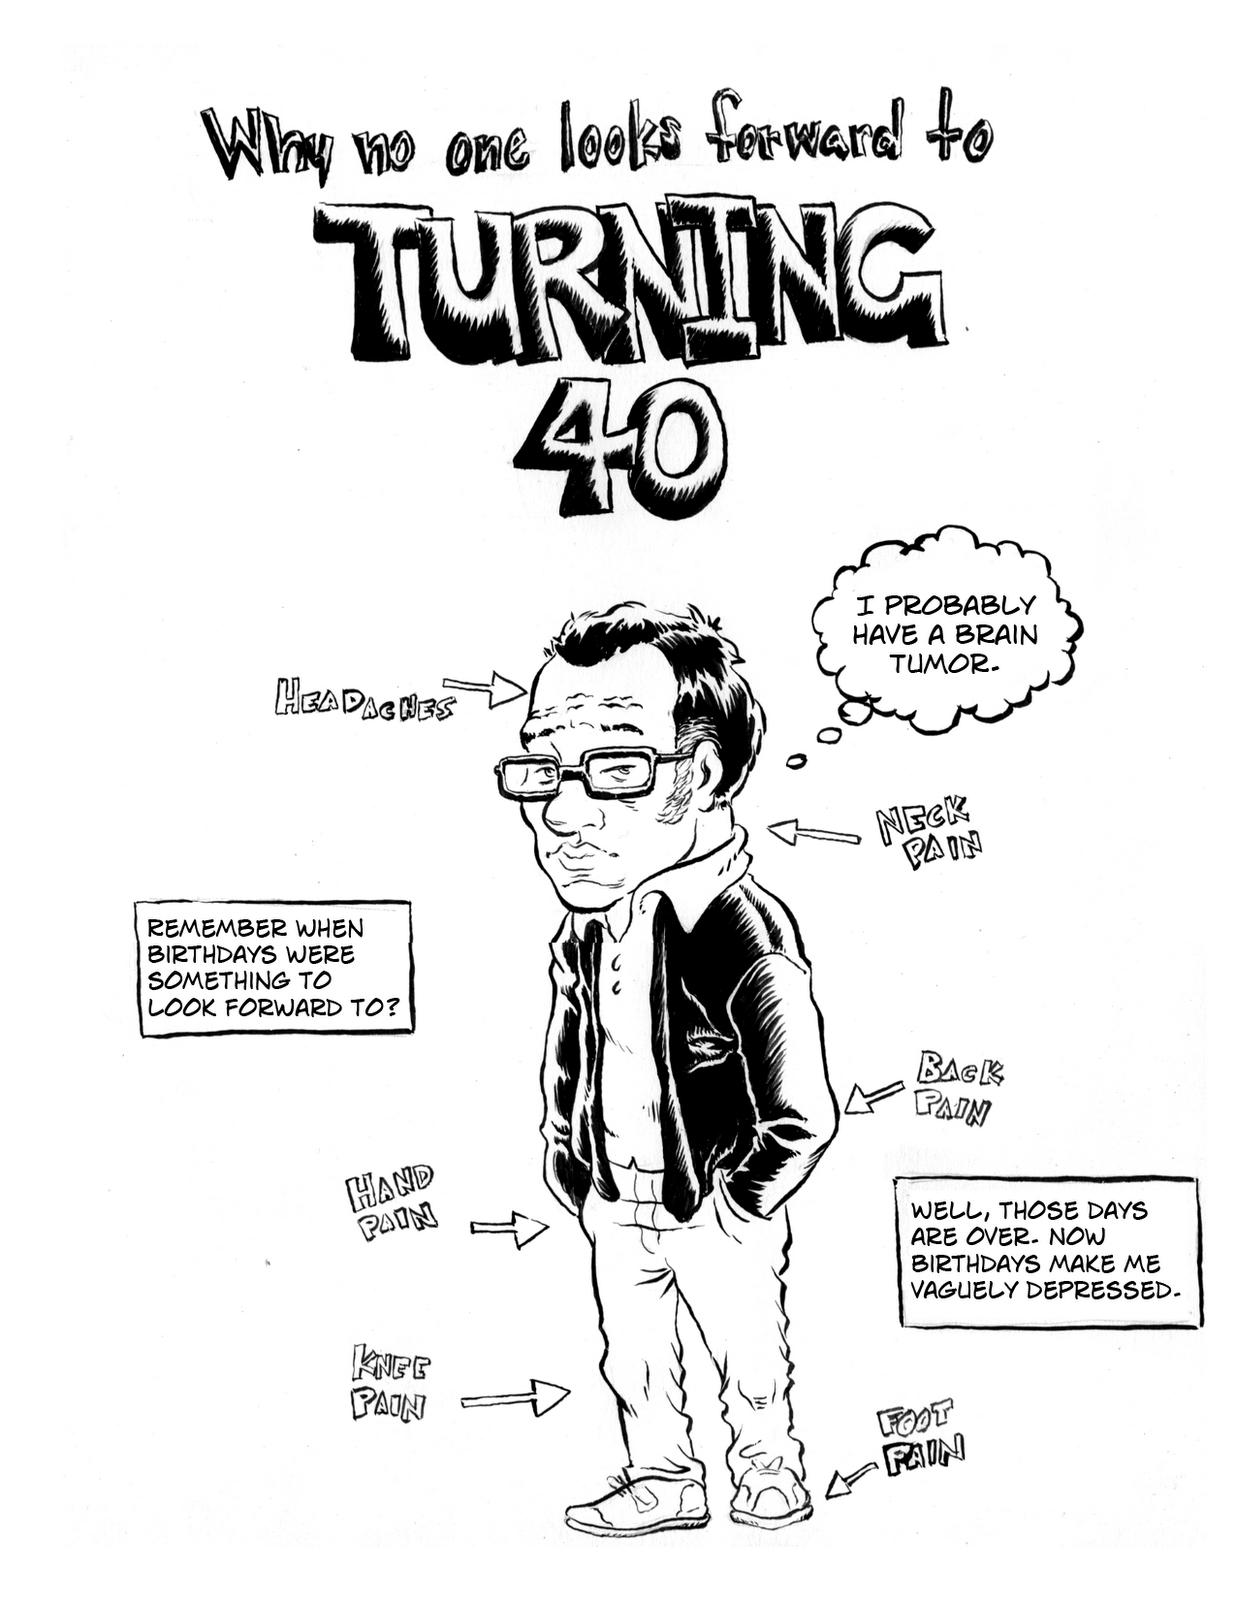 Men 40 Turning Quotes